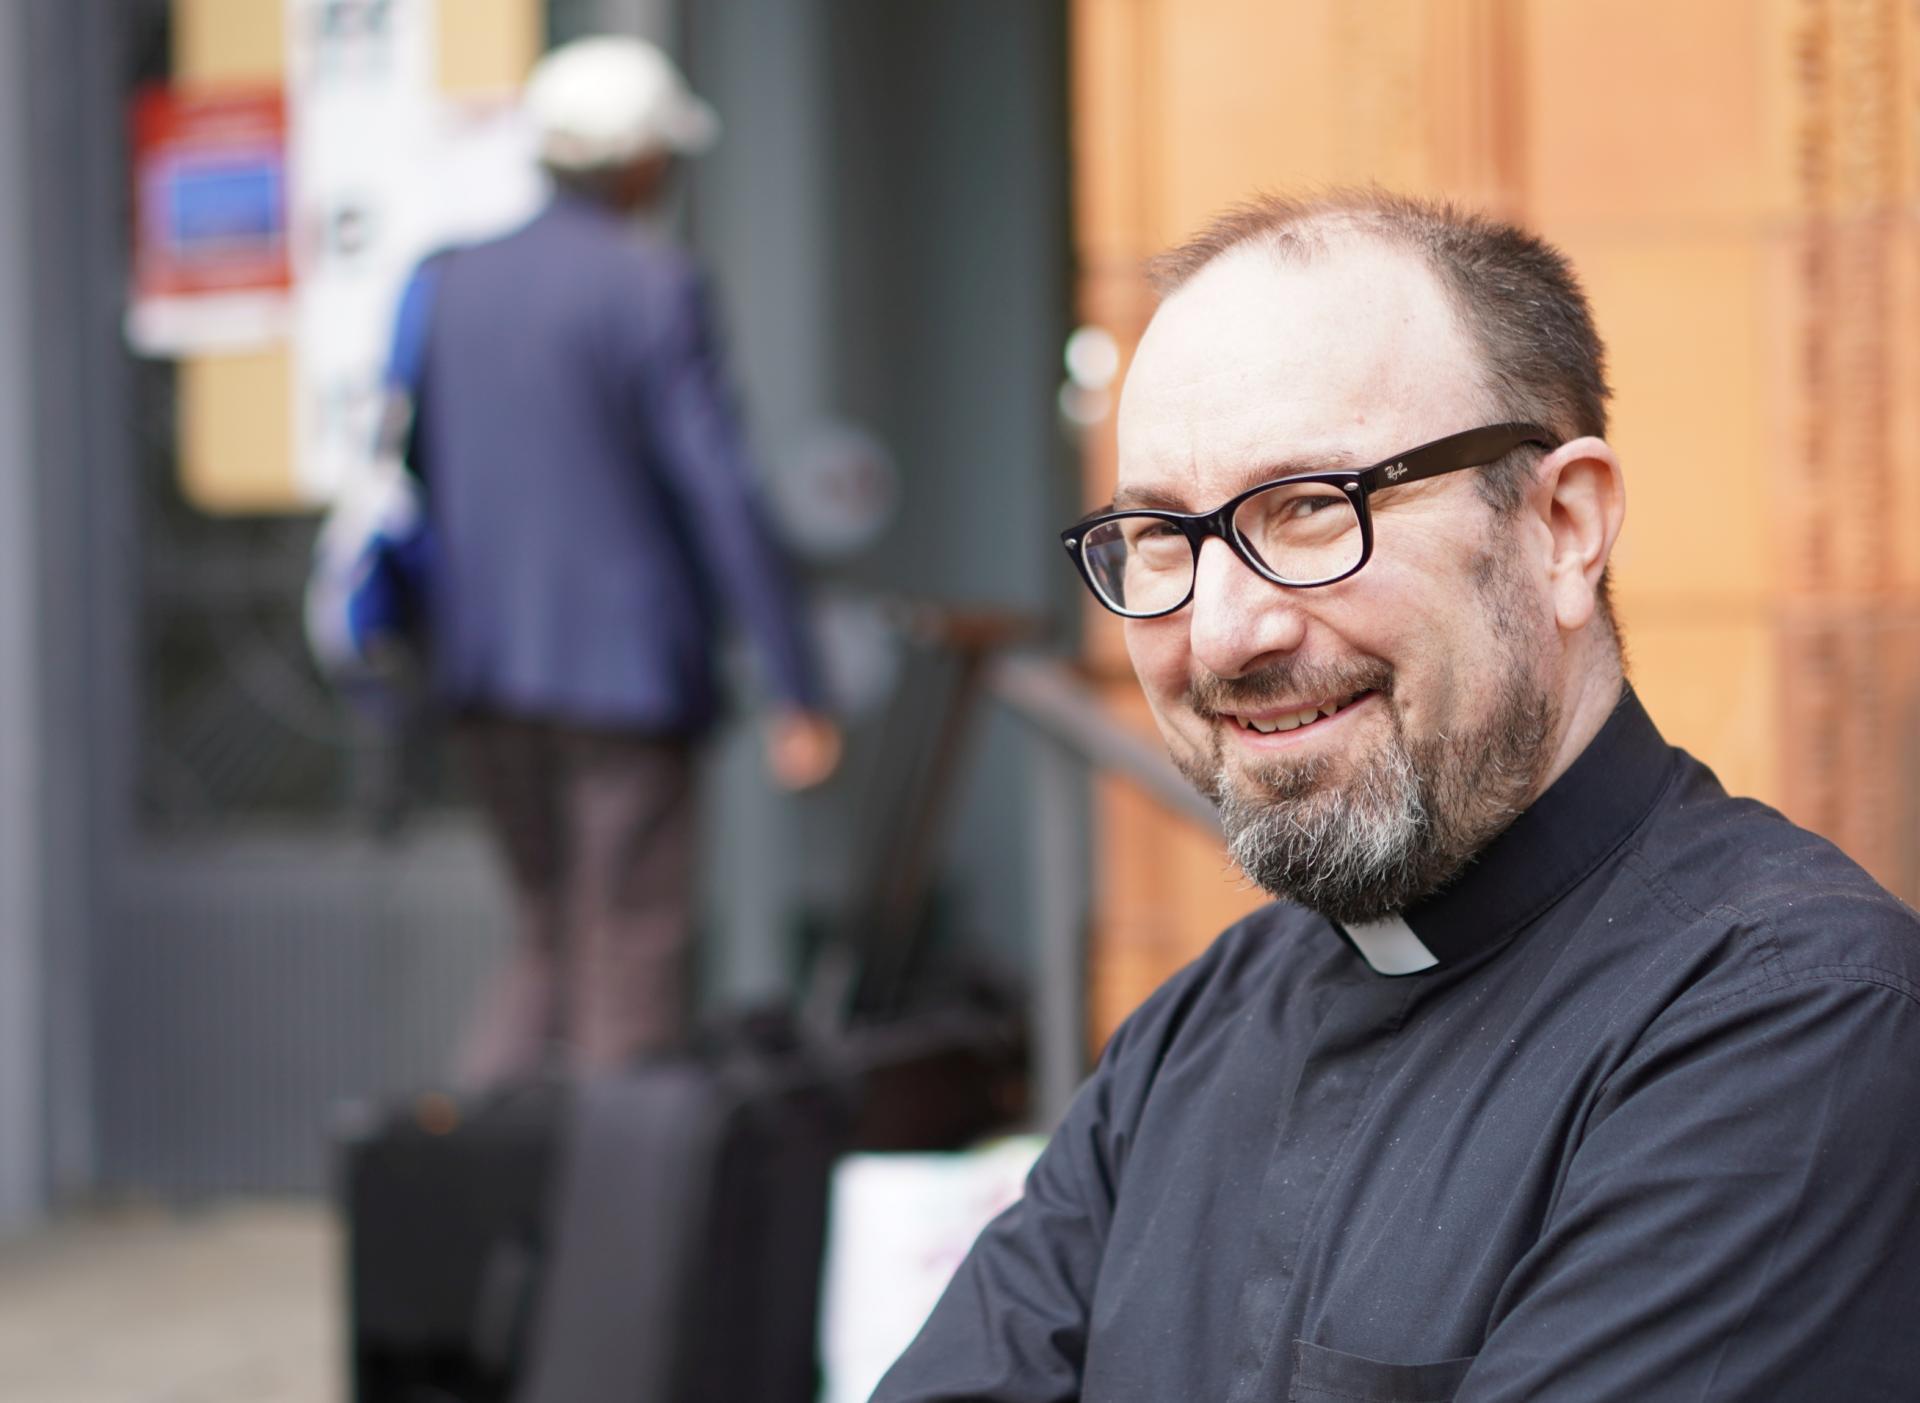 Pfarrer Michael Wiesböck